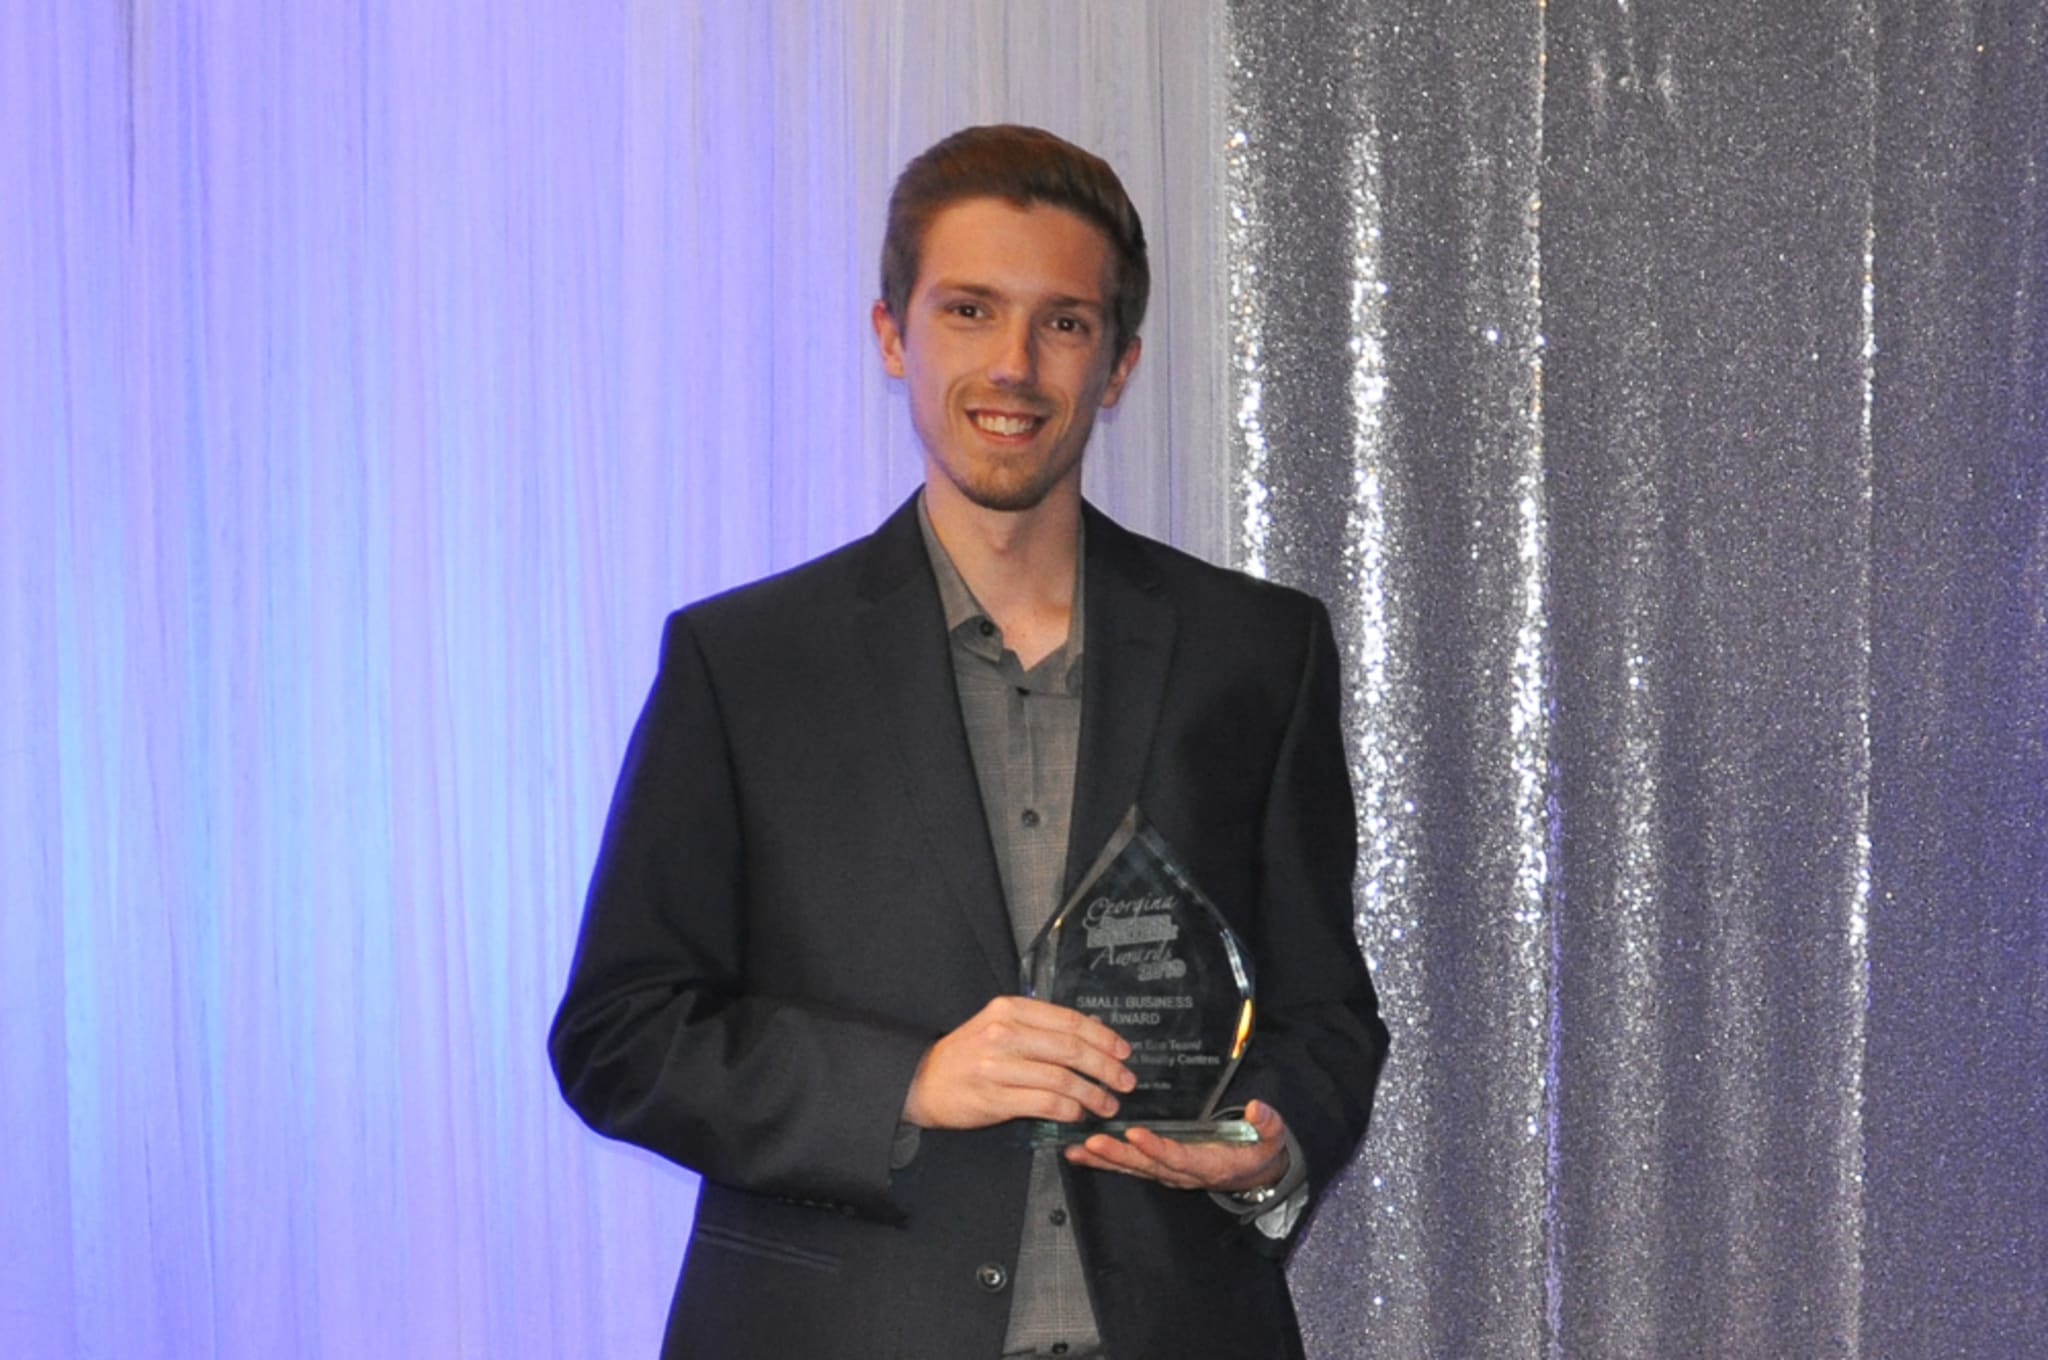 Small Business Award 2019 York Region Eco Team